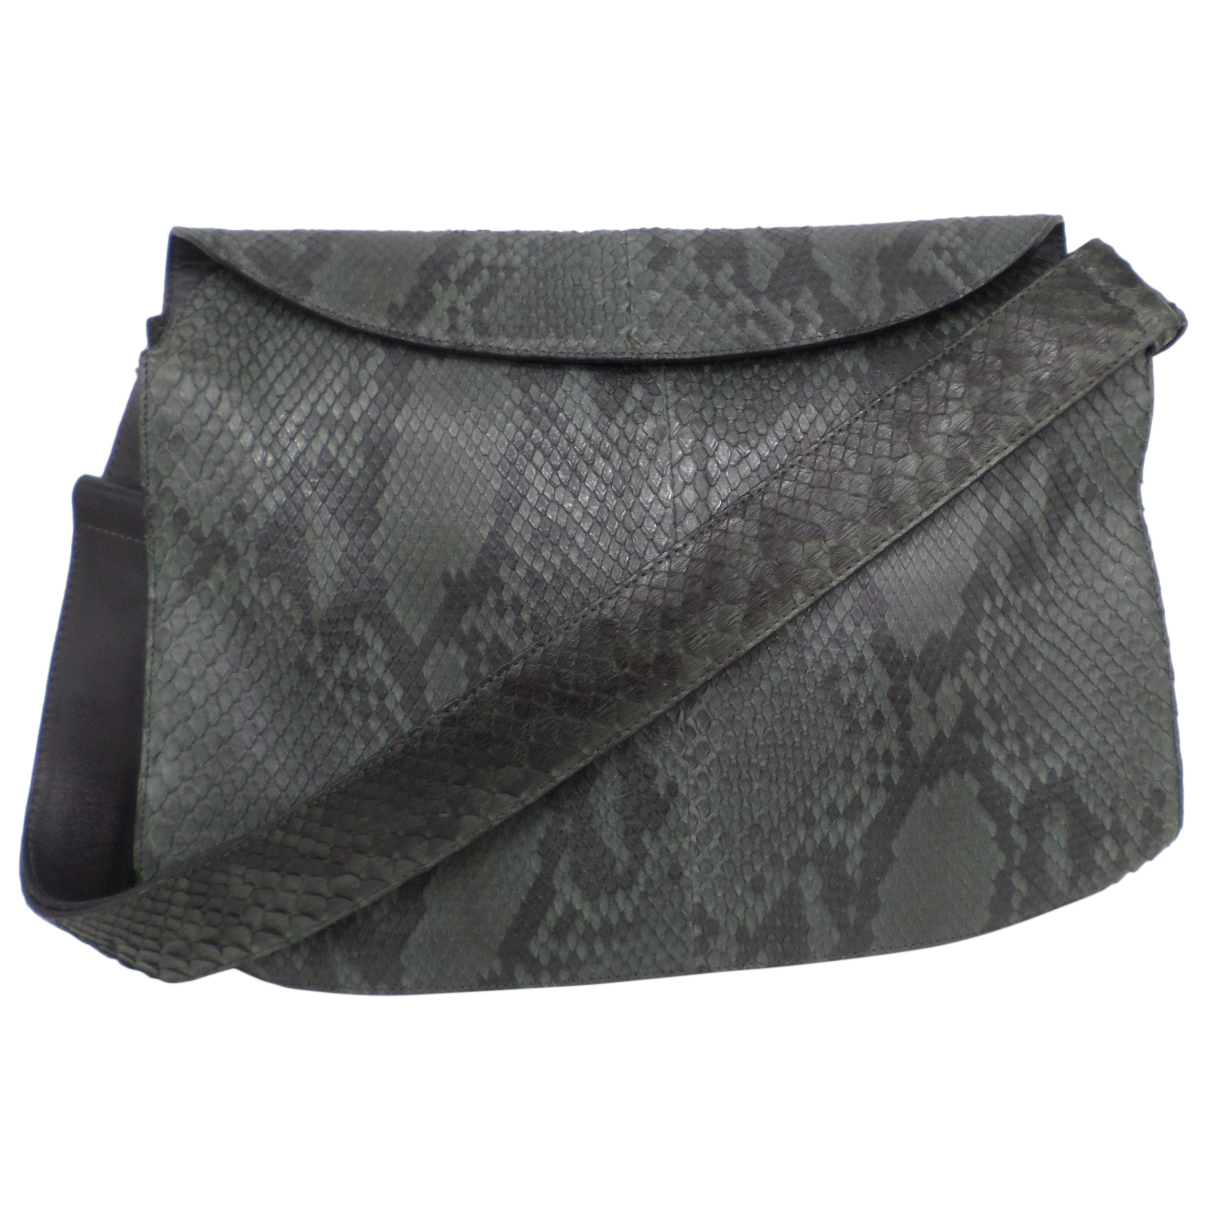 Bottega Veneta N Python handbag for Women N